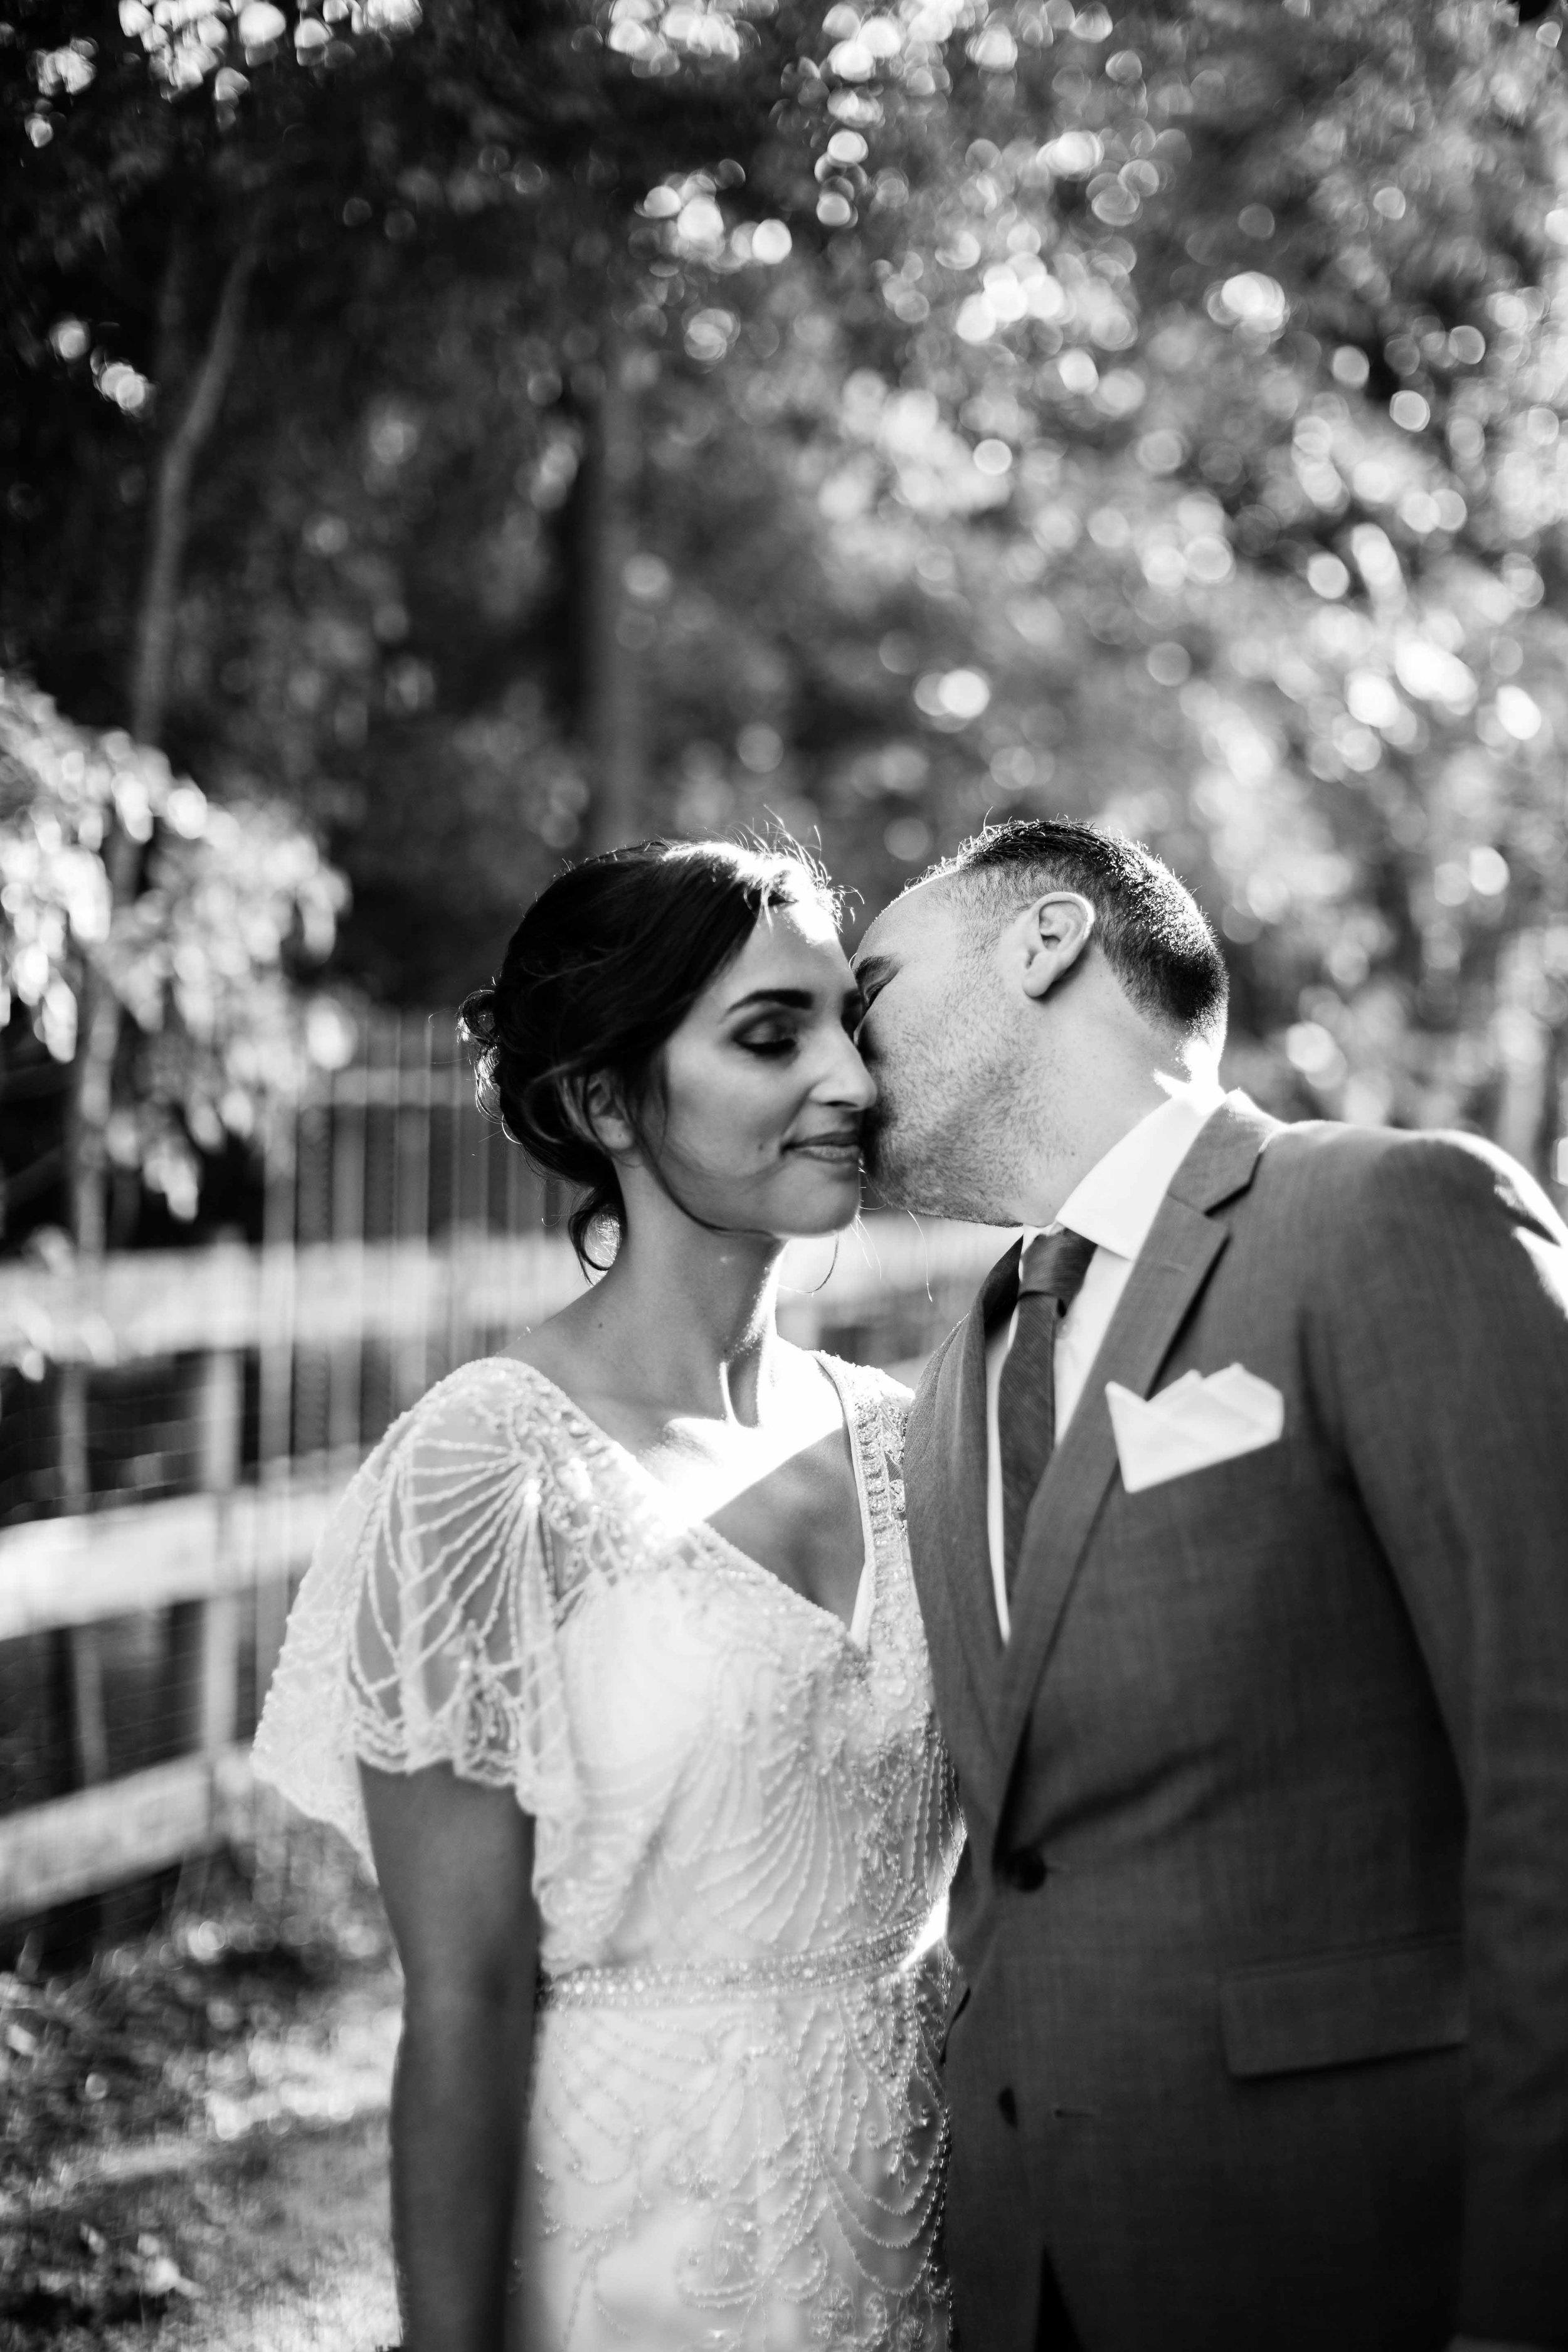 Cassandra & Justin Laidback wedding in wine country - Sonoma, CA